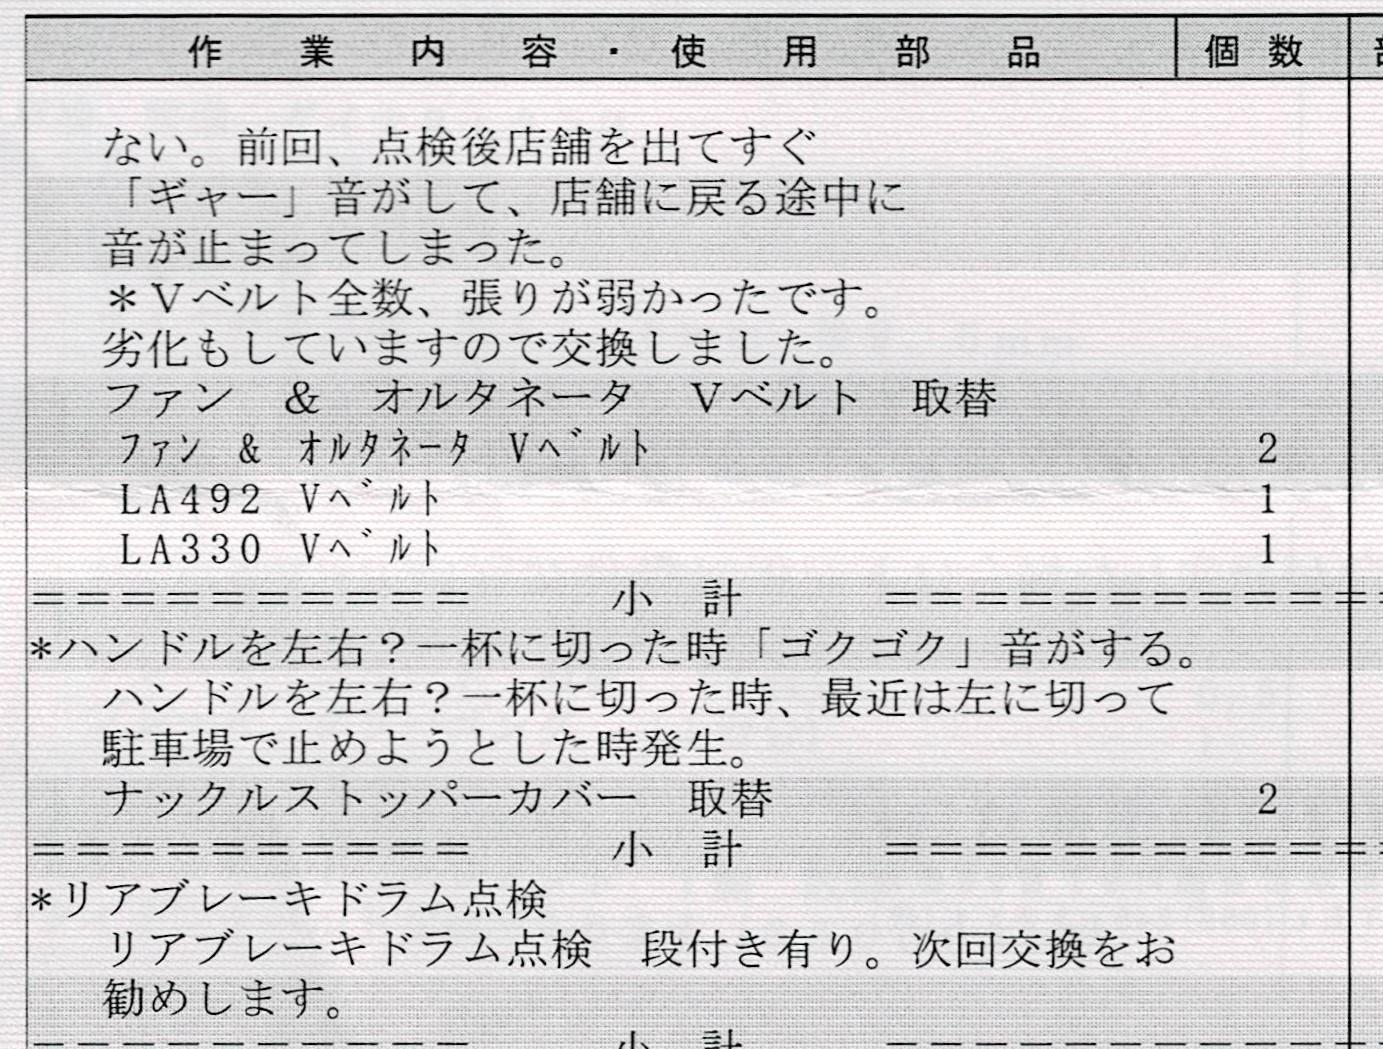 Scan2020-12-25_051717_0011.jpg